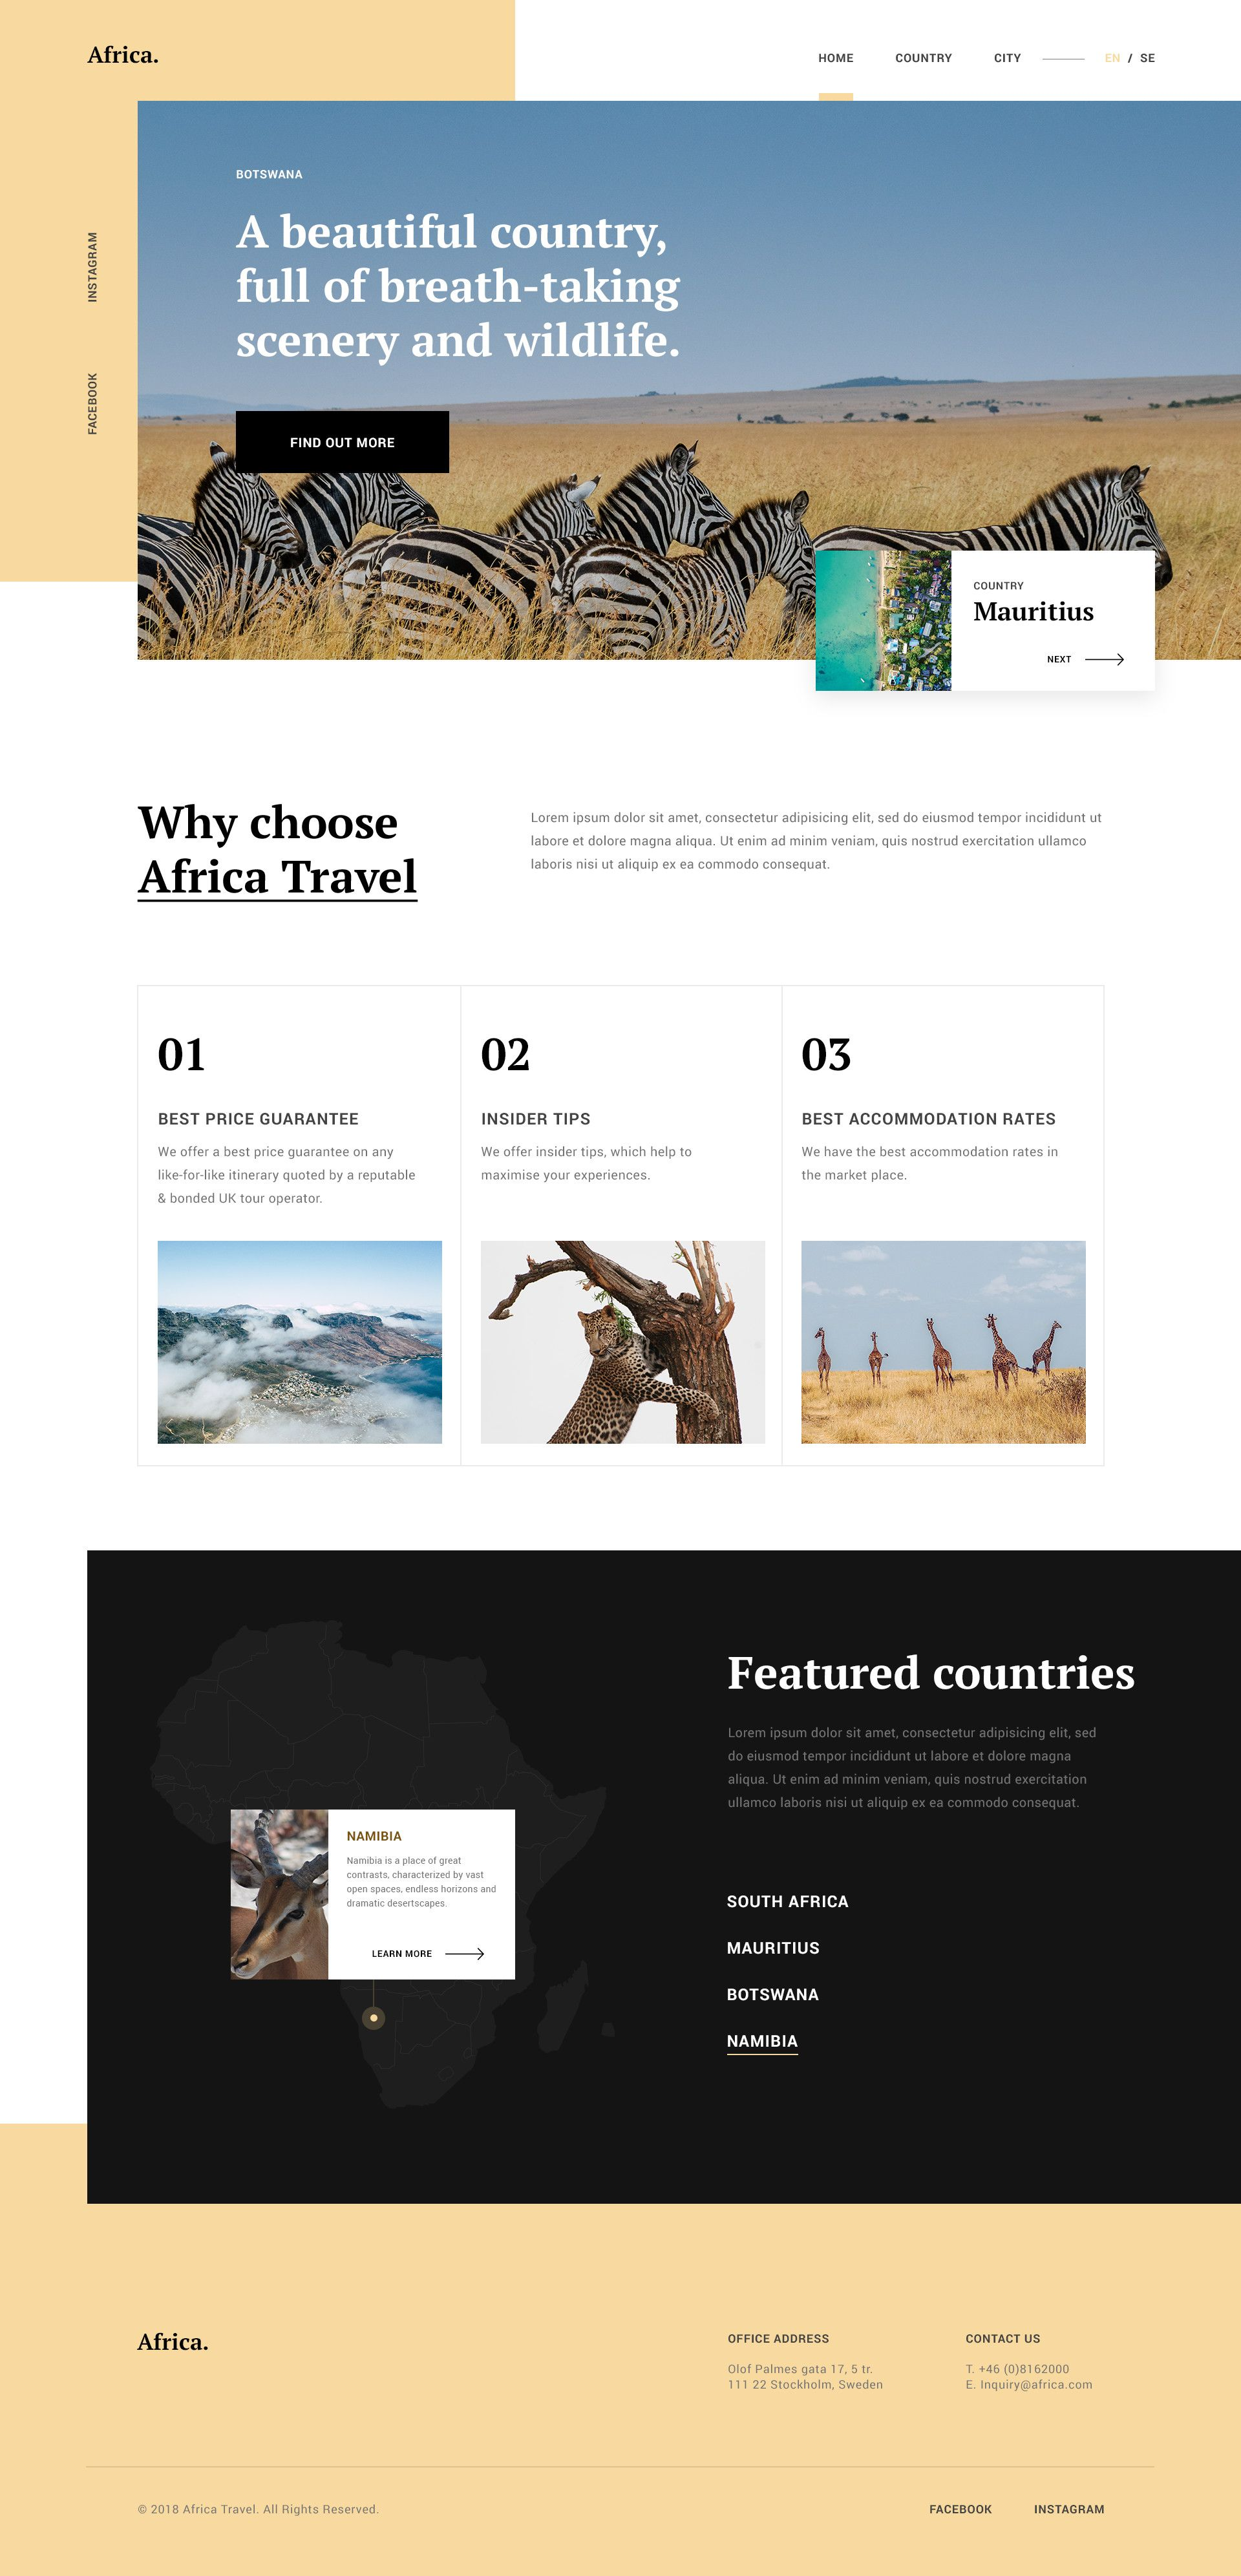 Africa Travel Guide Travel Guides Layout Travel Guide Design Travel Website Design